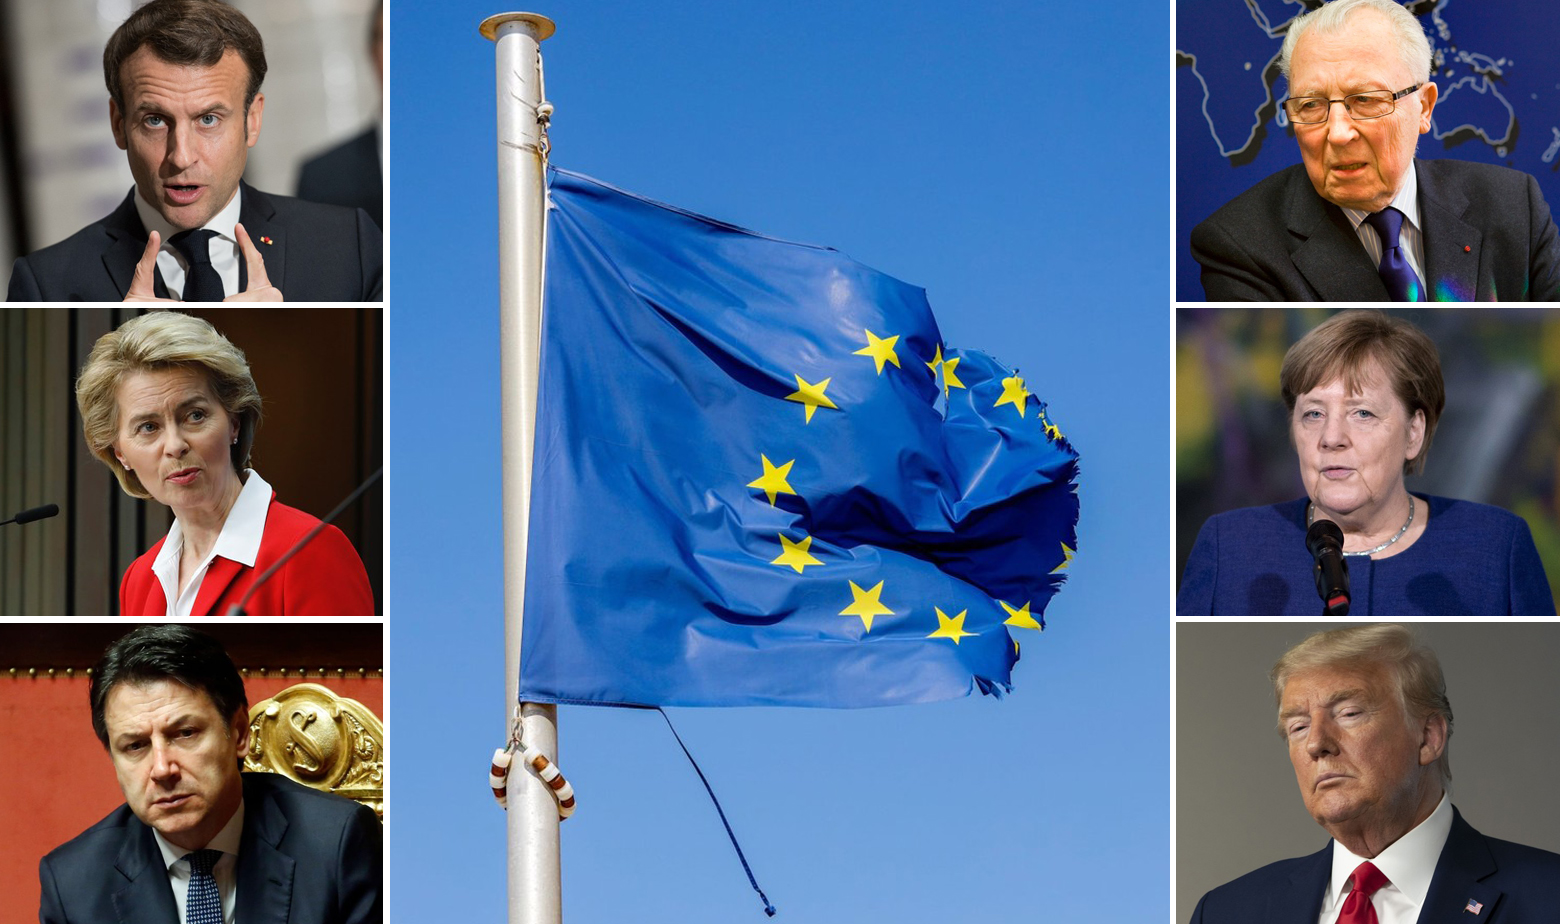 Lijevo, s gore na dolje: Emmanuel Macron, Ursula von der Leyen, Giuseppe Conte; Desno, s gore na dolje: Jacques Delors, Angela Merkel, Donald Trump